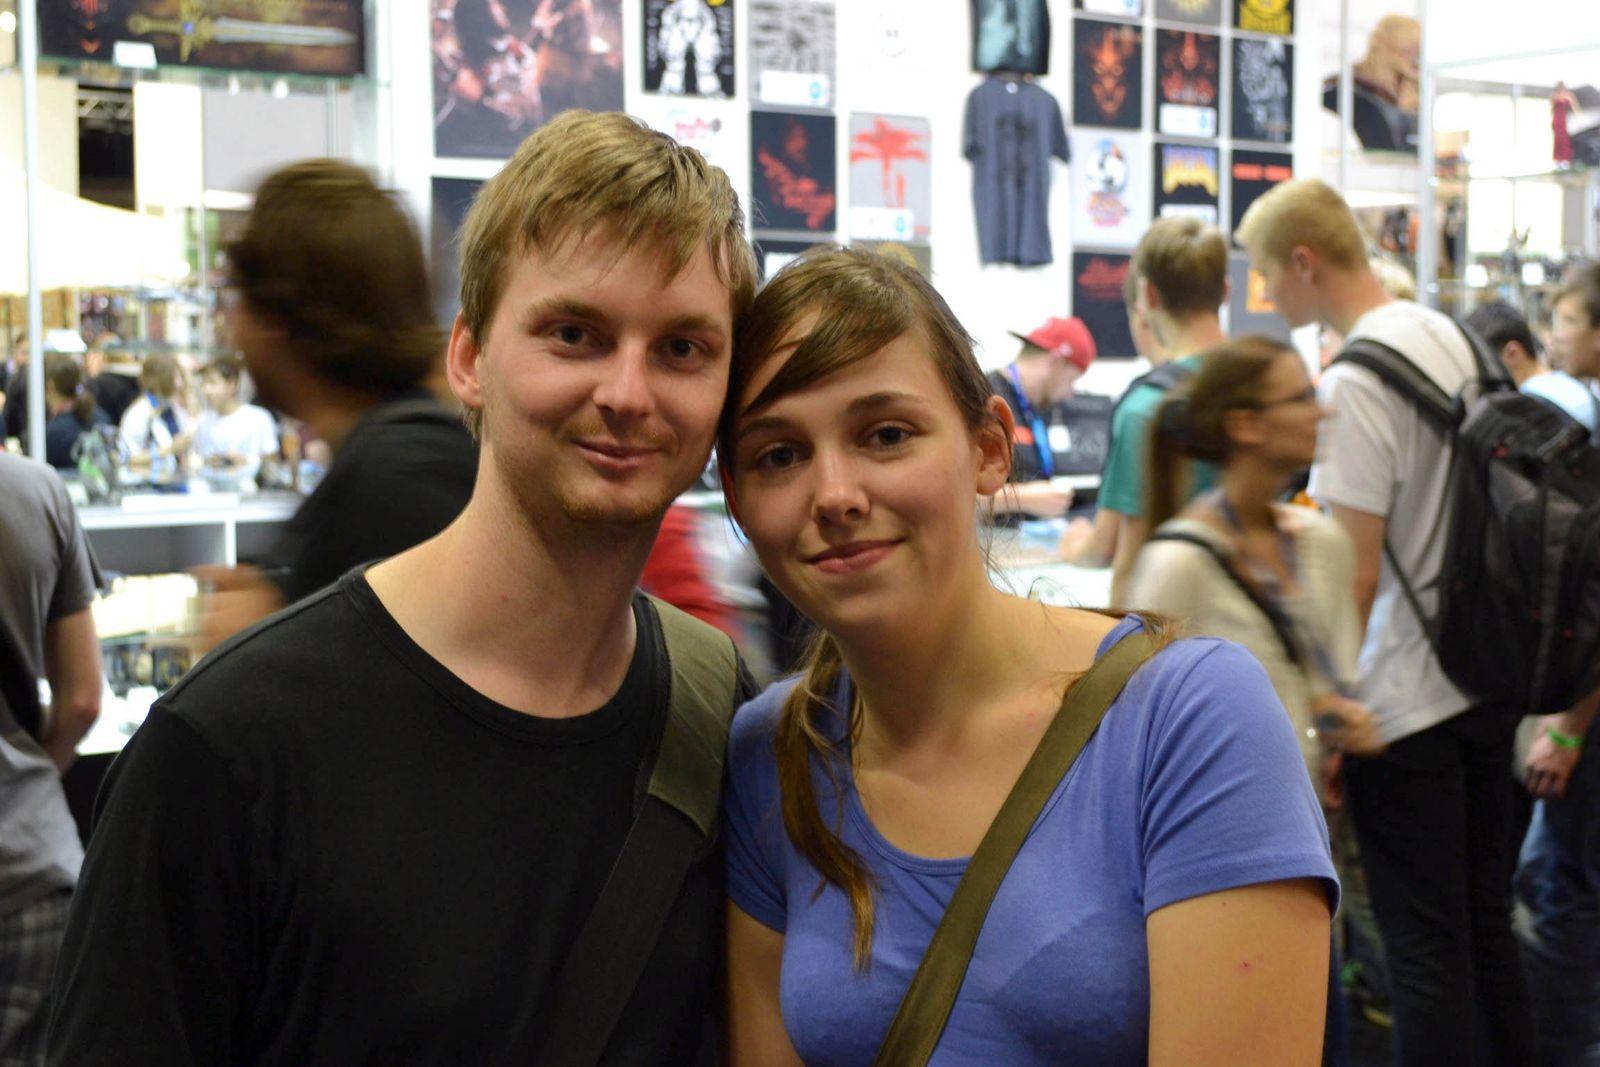 Pärchenfotos Gamescom/ Daniel und Malena